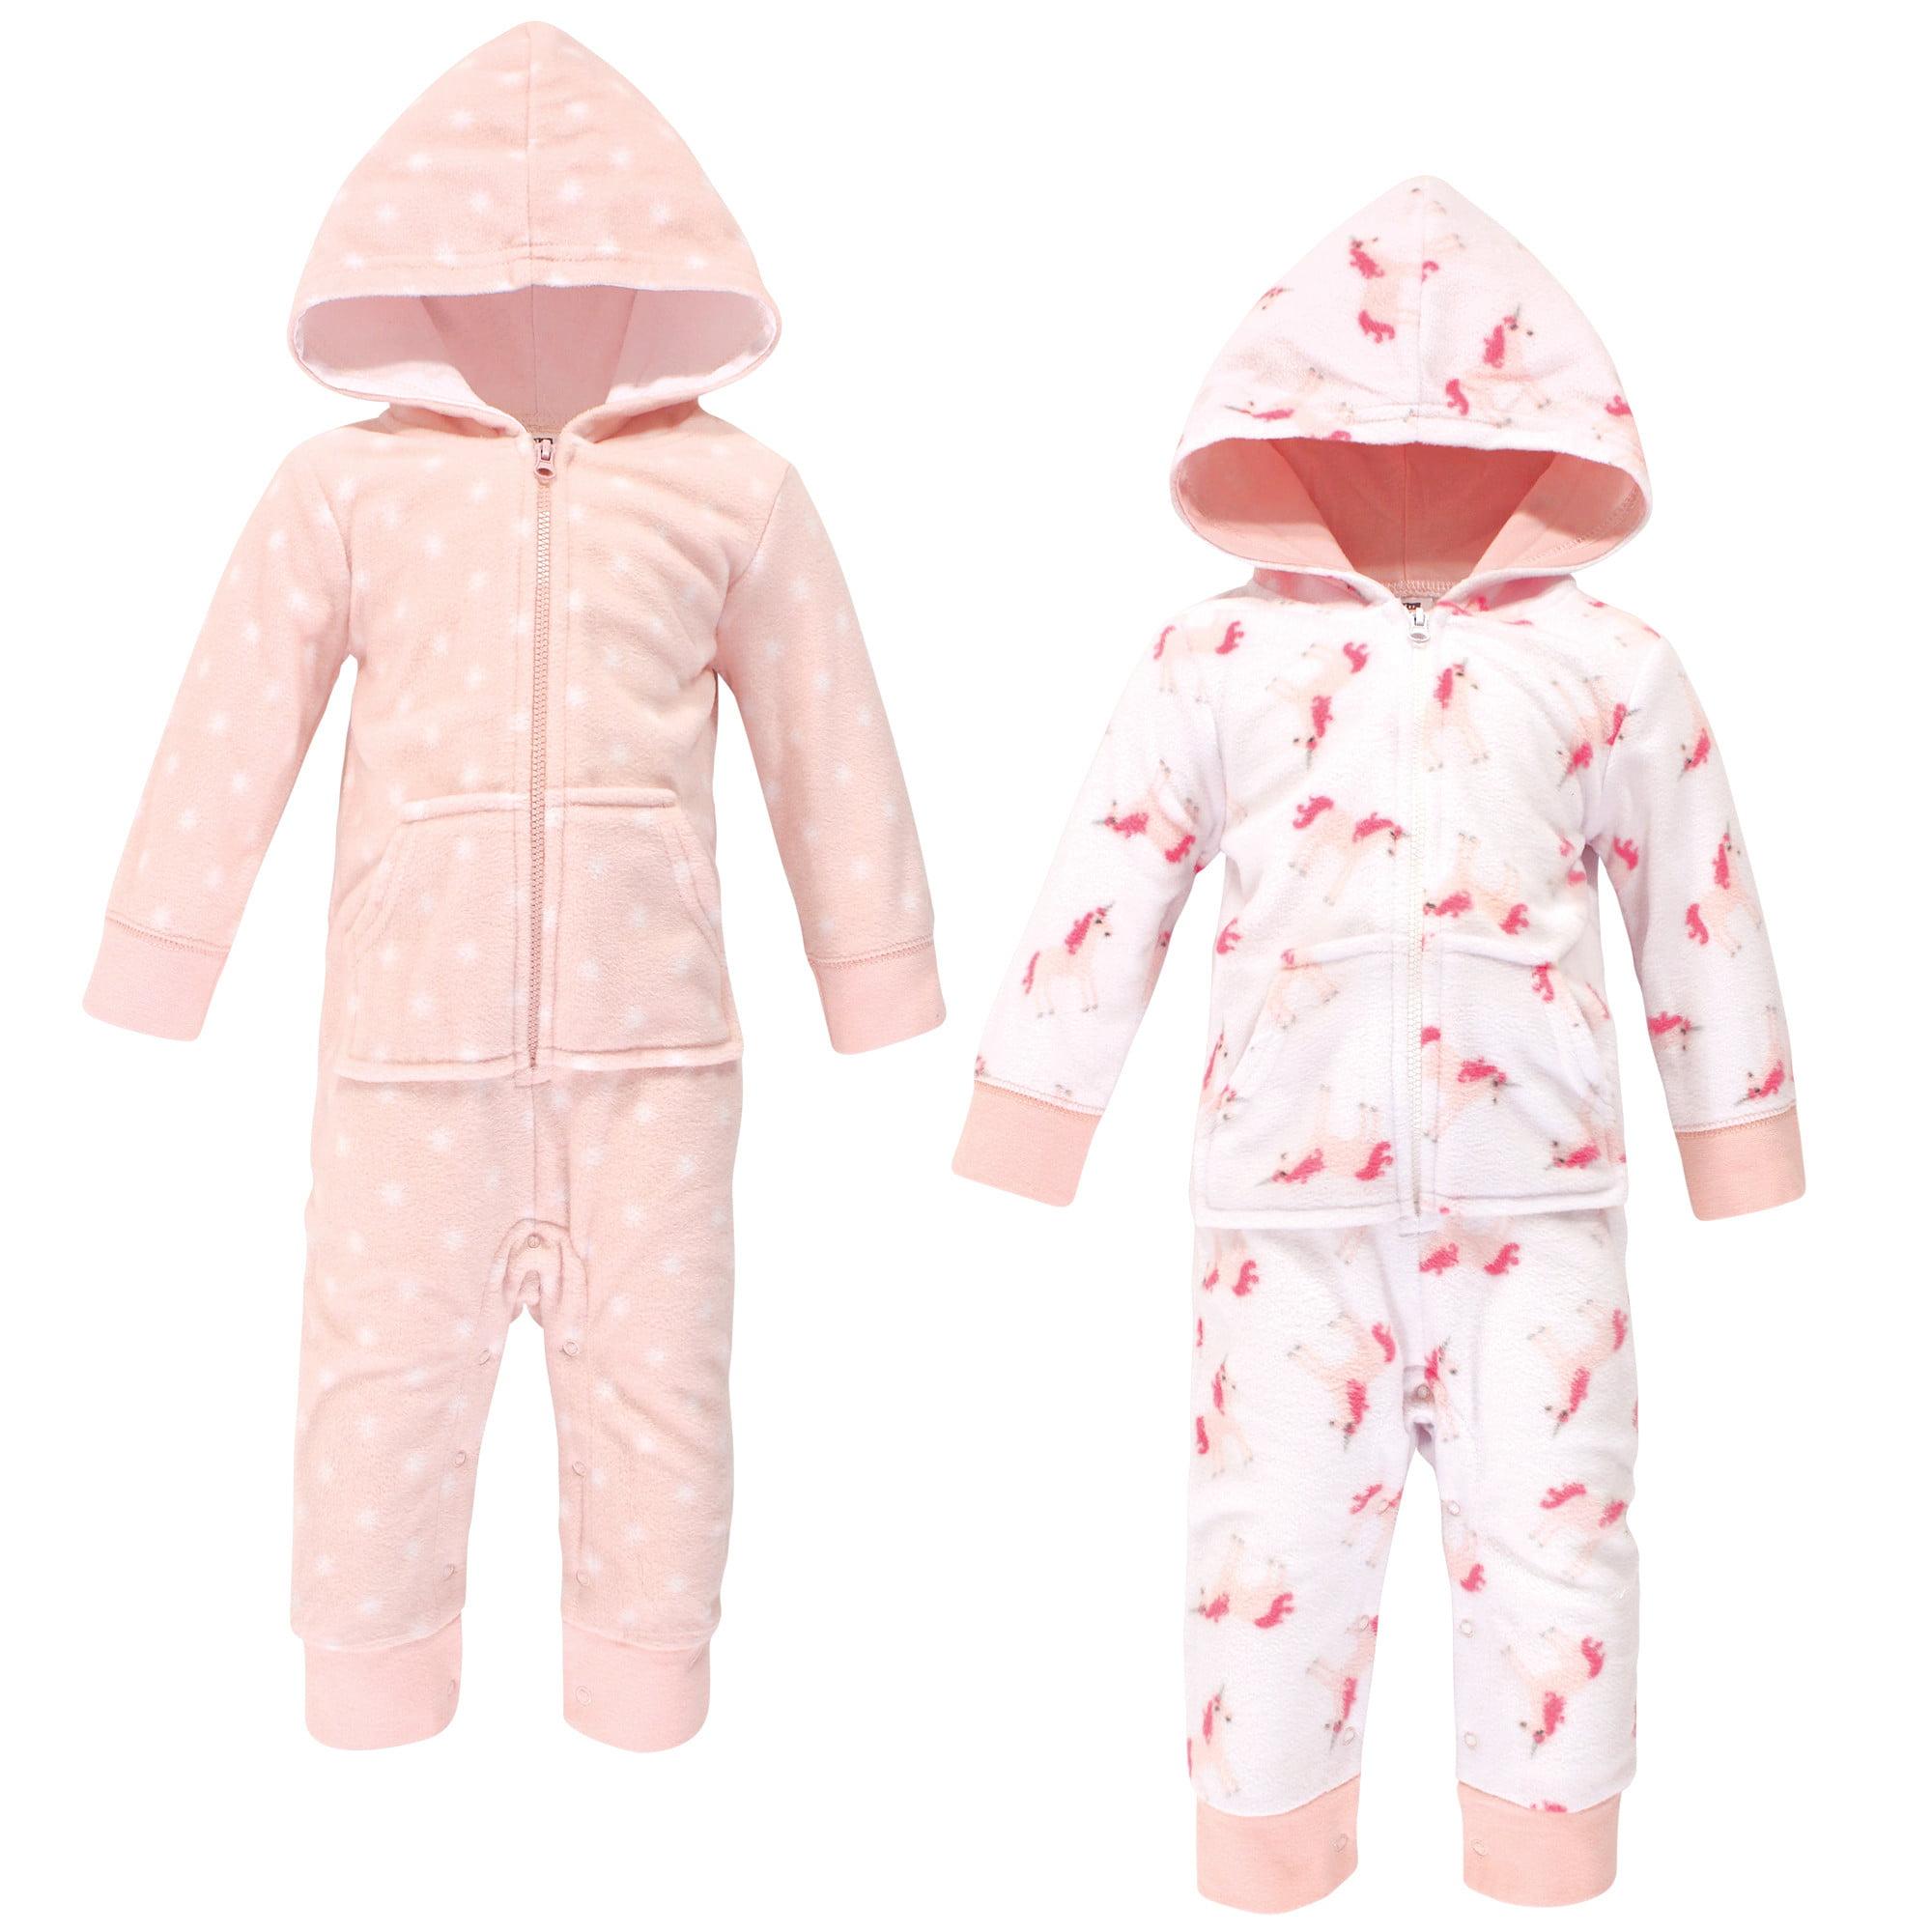 Baby Boys Sea Turtle Japan Flag Short Sleeve Climbing Clothes Pajamas Sleepwear Suit 6-24 Months